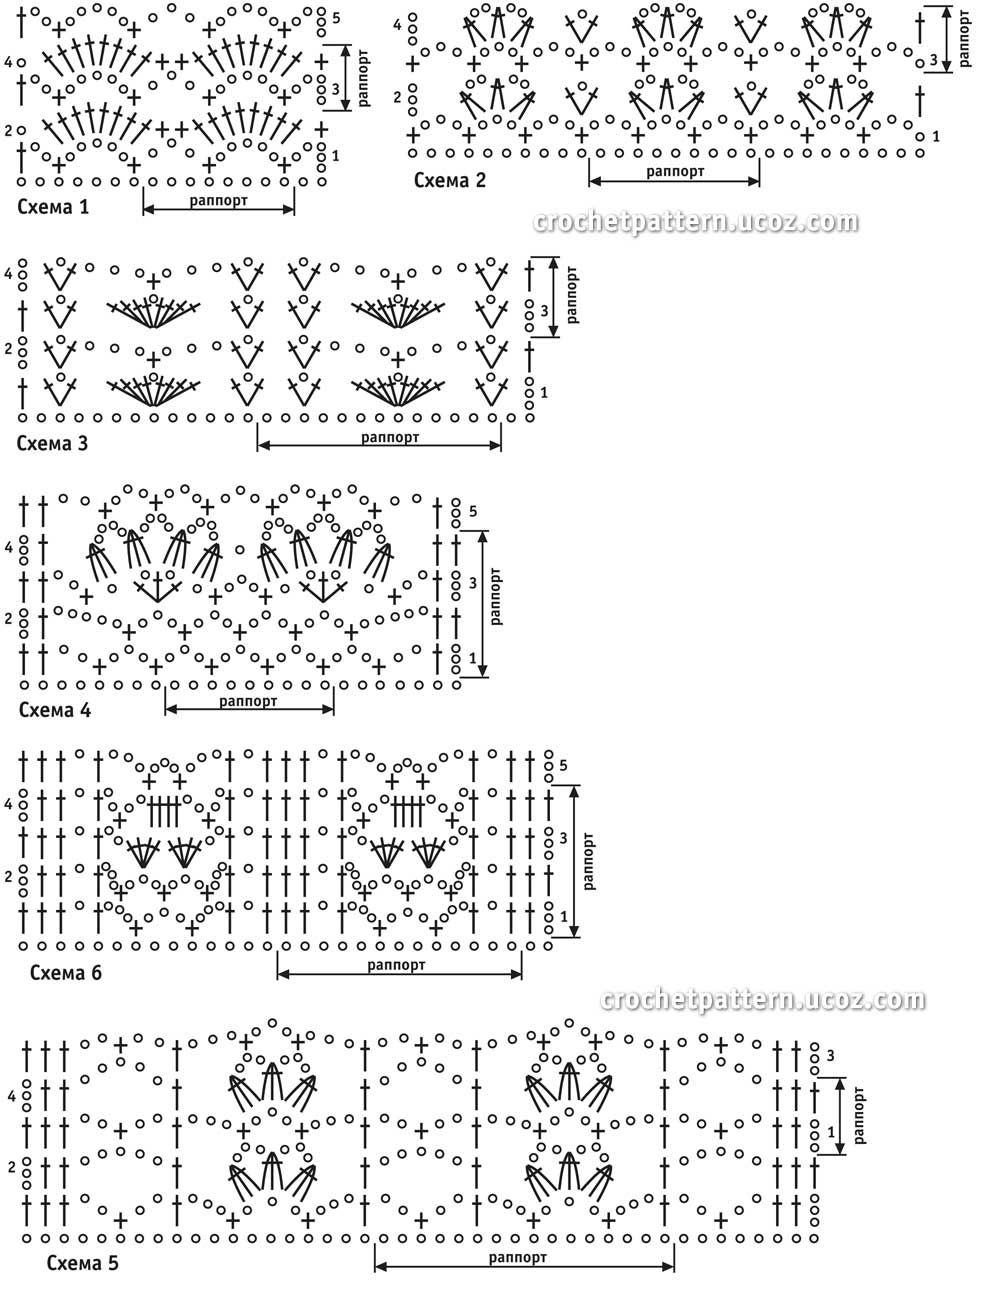 ... ????? crochet Patterns- Diagrams Pinterest